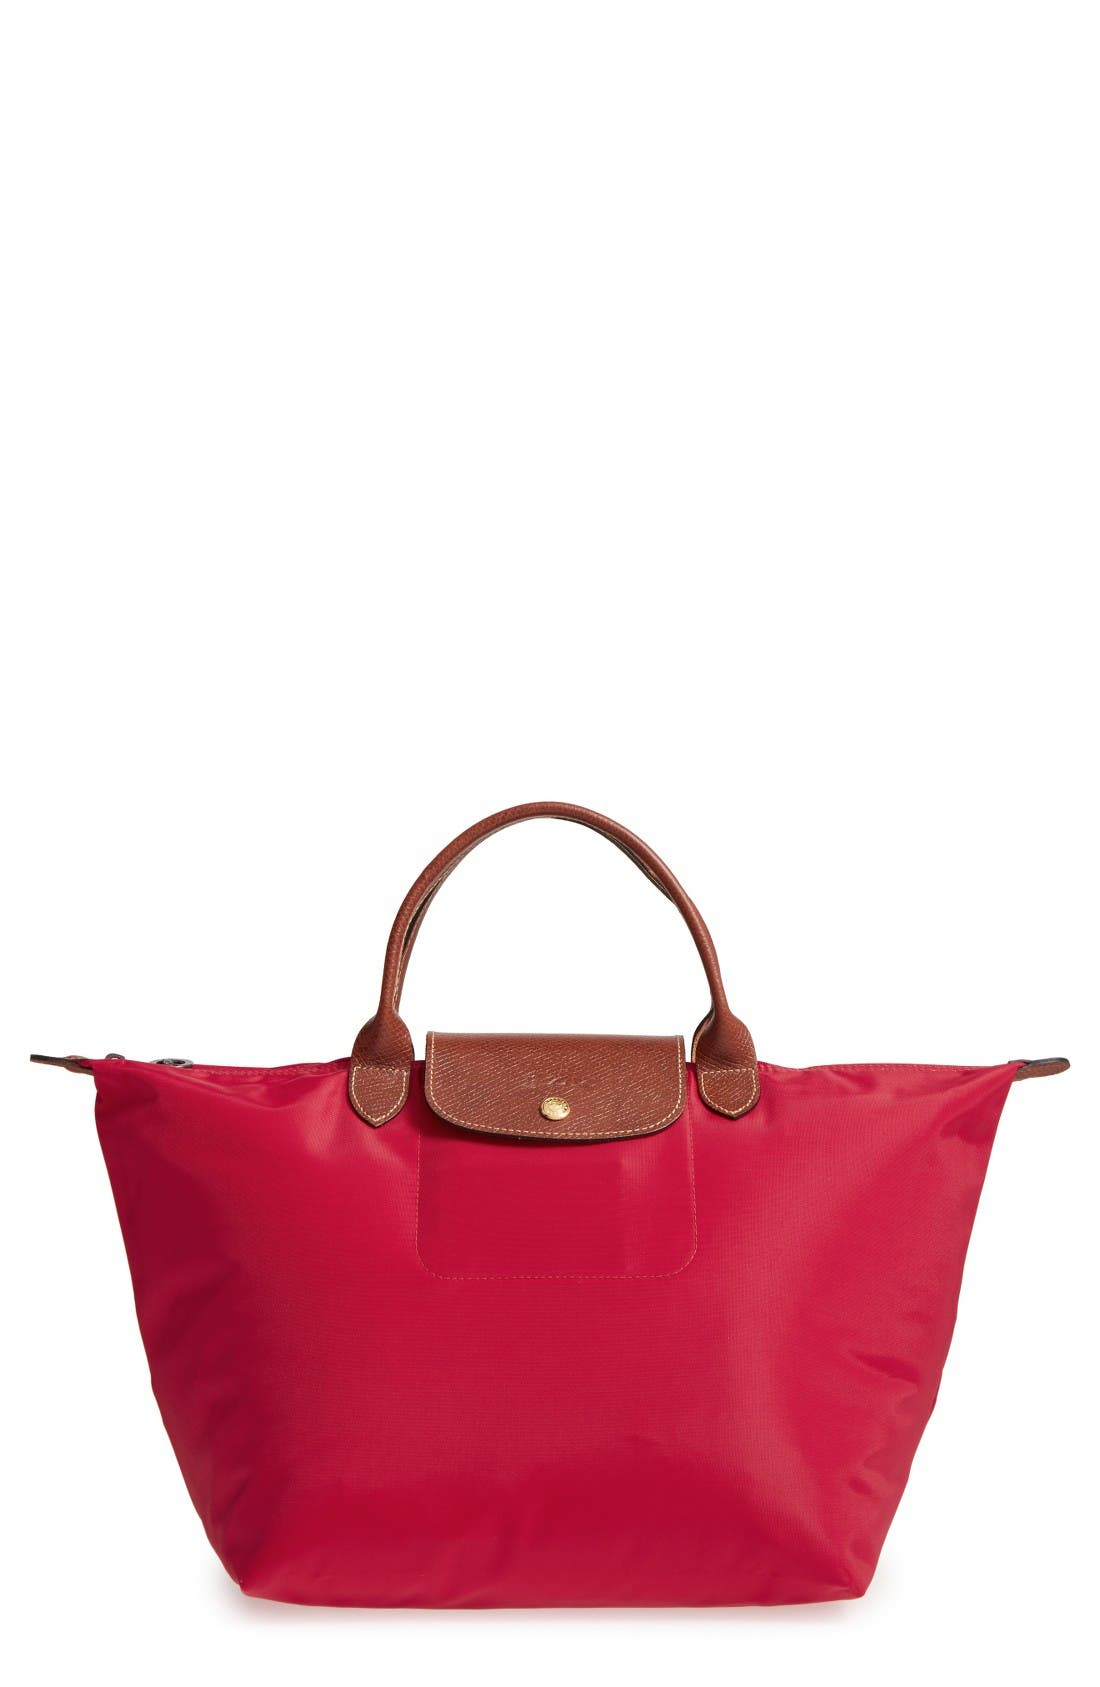 Alternate Image 1 Selected - Longchamp 'Medium Le Pliage' Tote